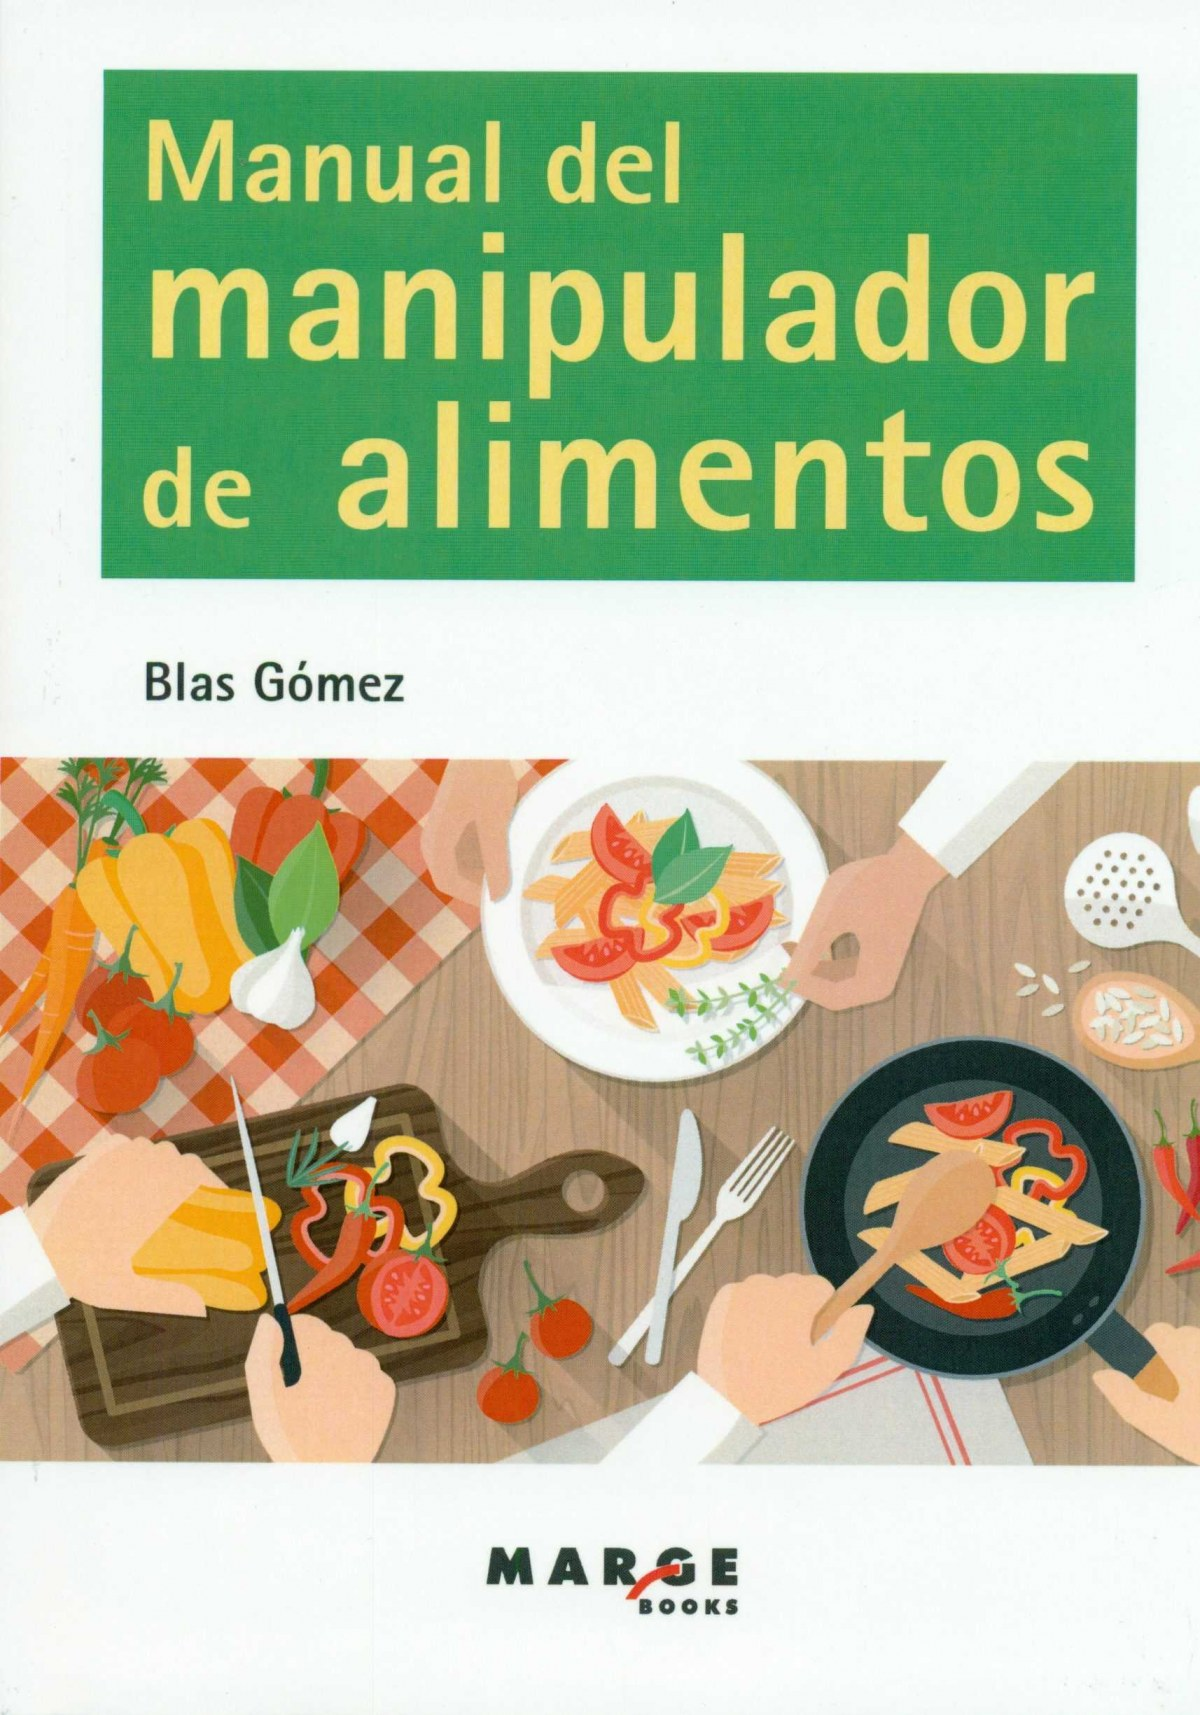 Manual del manipulador de alimentos 9788416171408